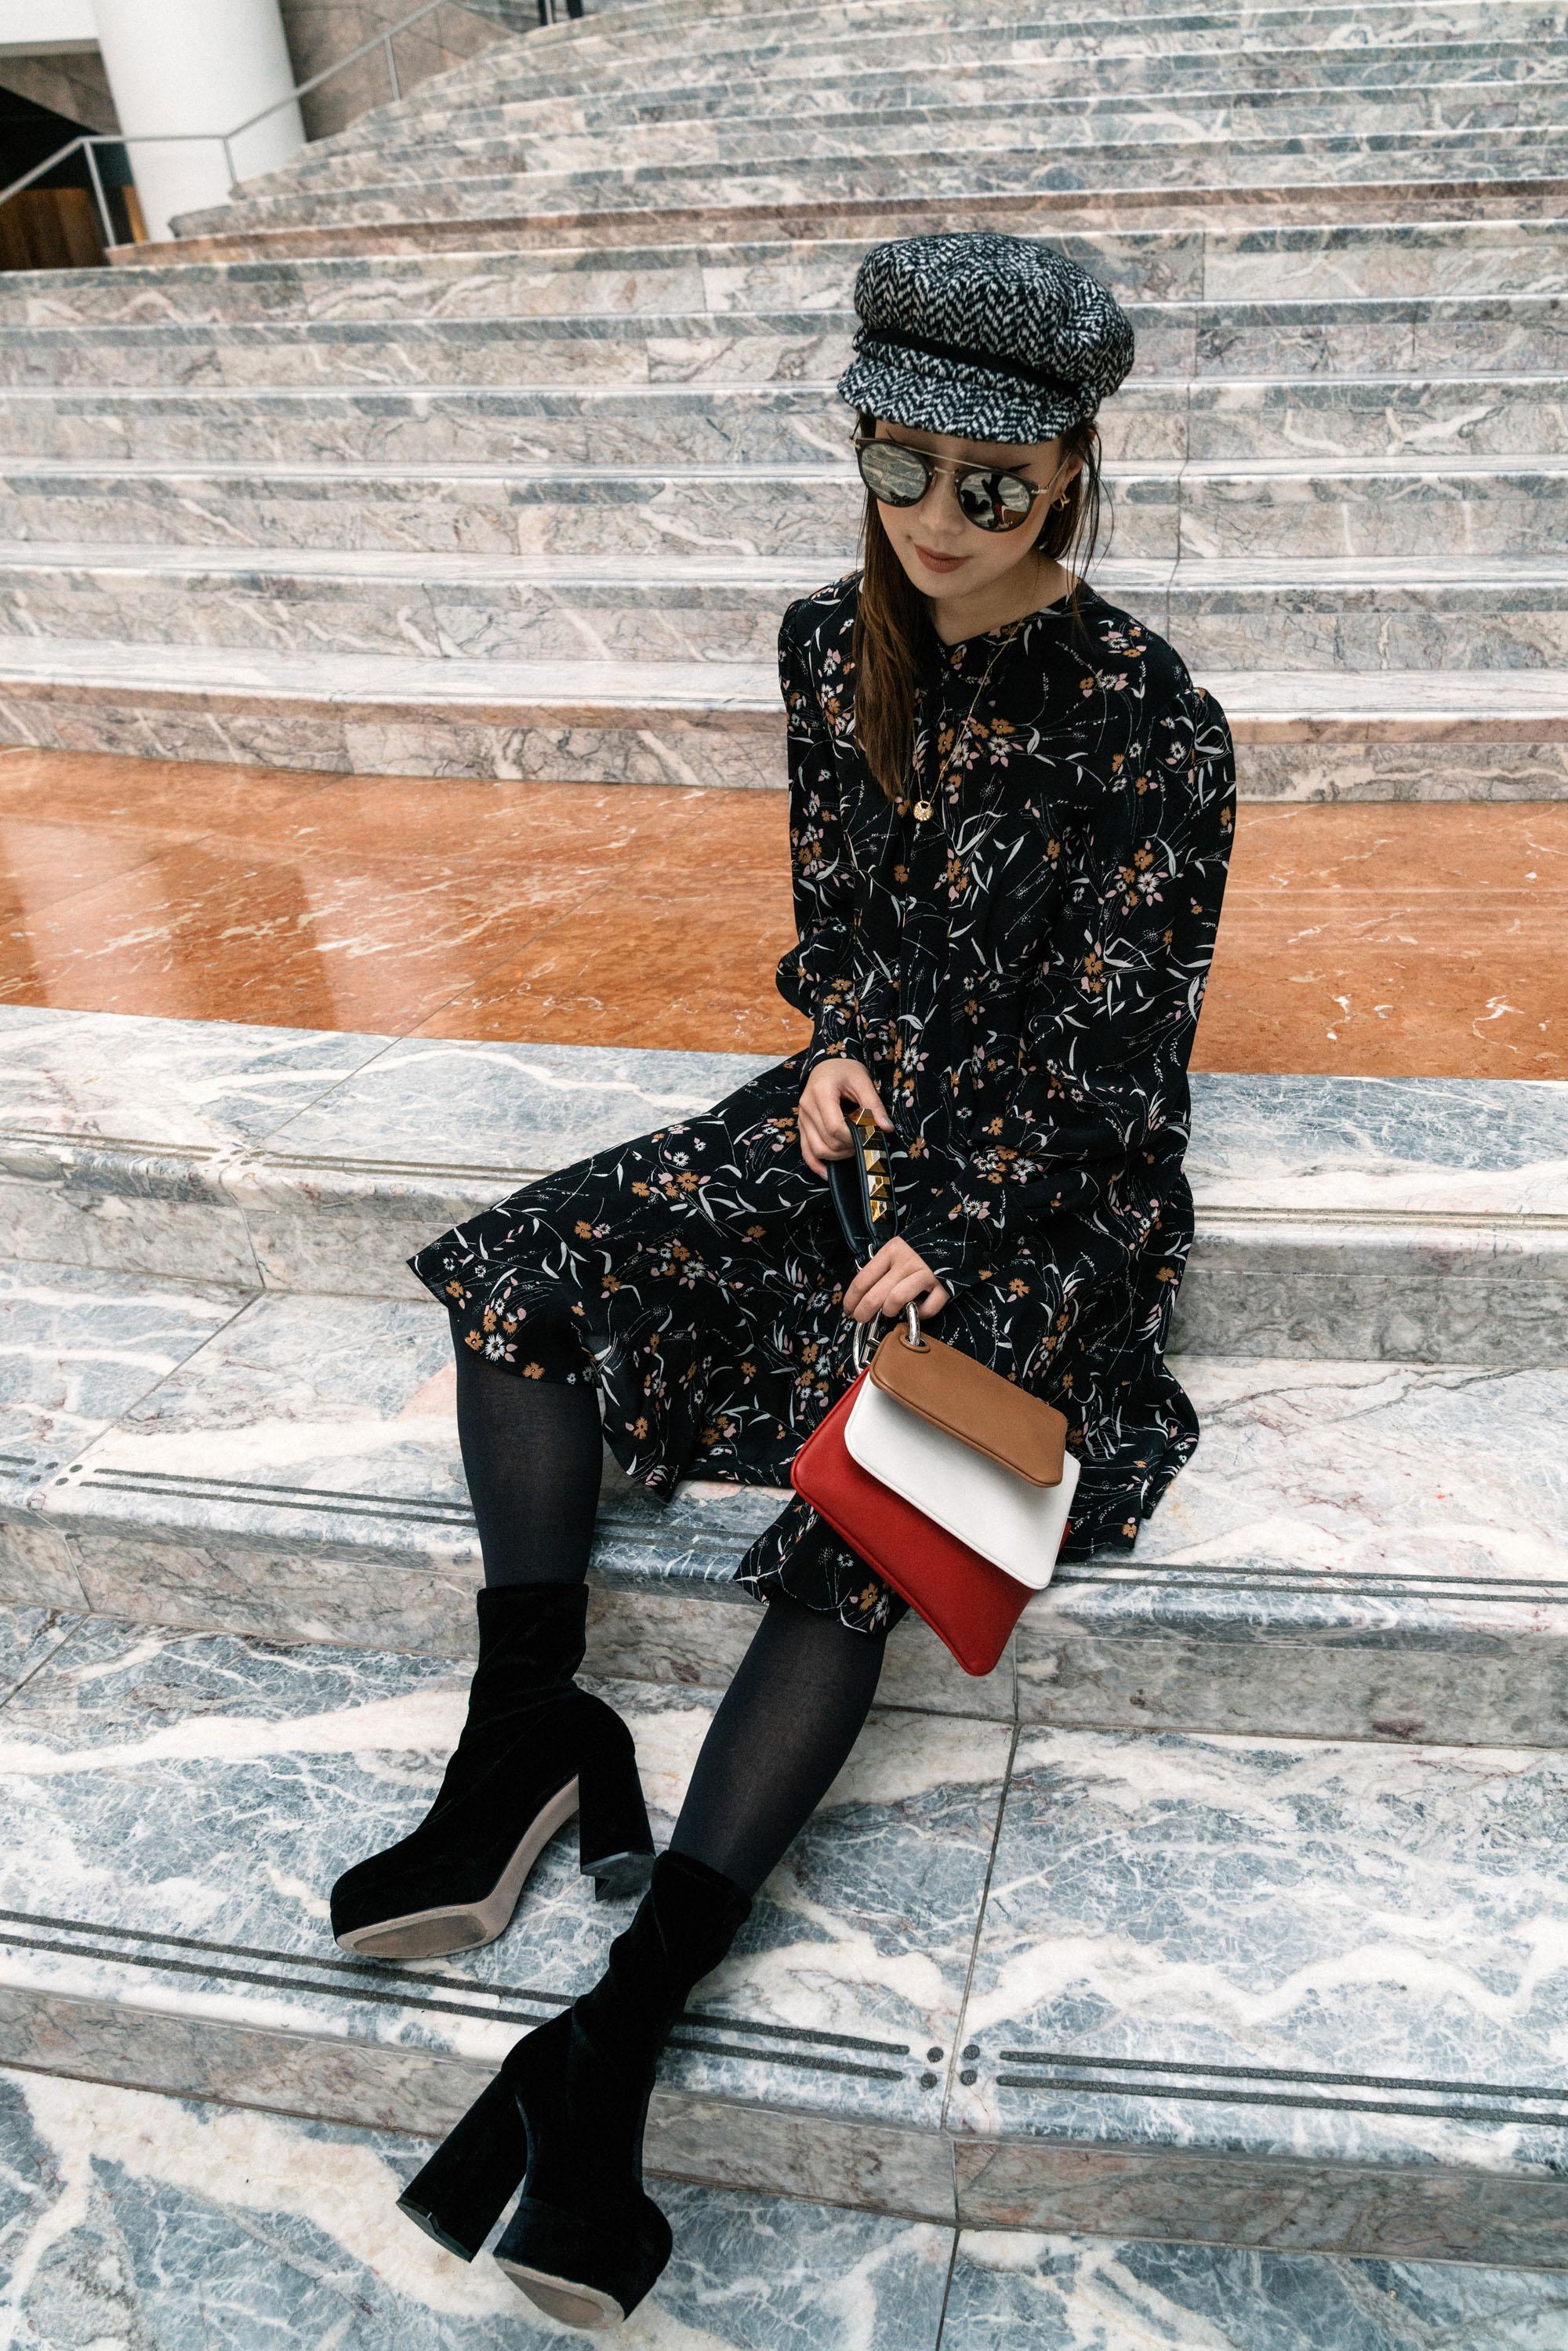 Isabel Marant Dress,  Fendi Pouch , Miu Miu Boots,  Eugenia Kim Hat ,  Oliver Peoples Sunglasses